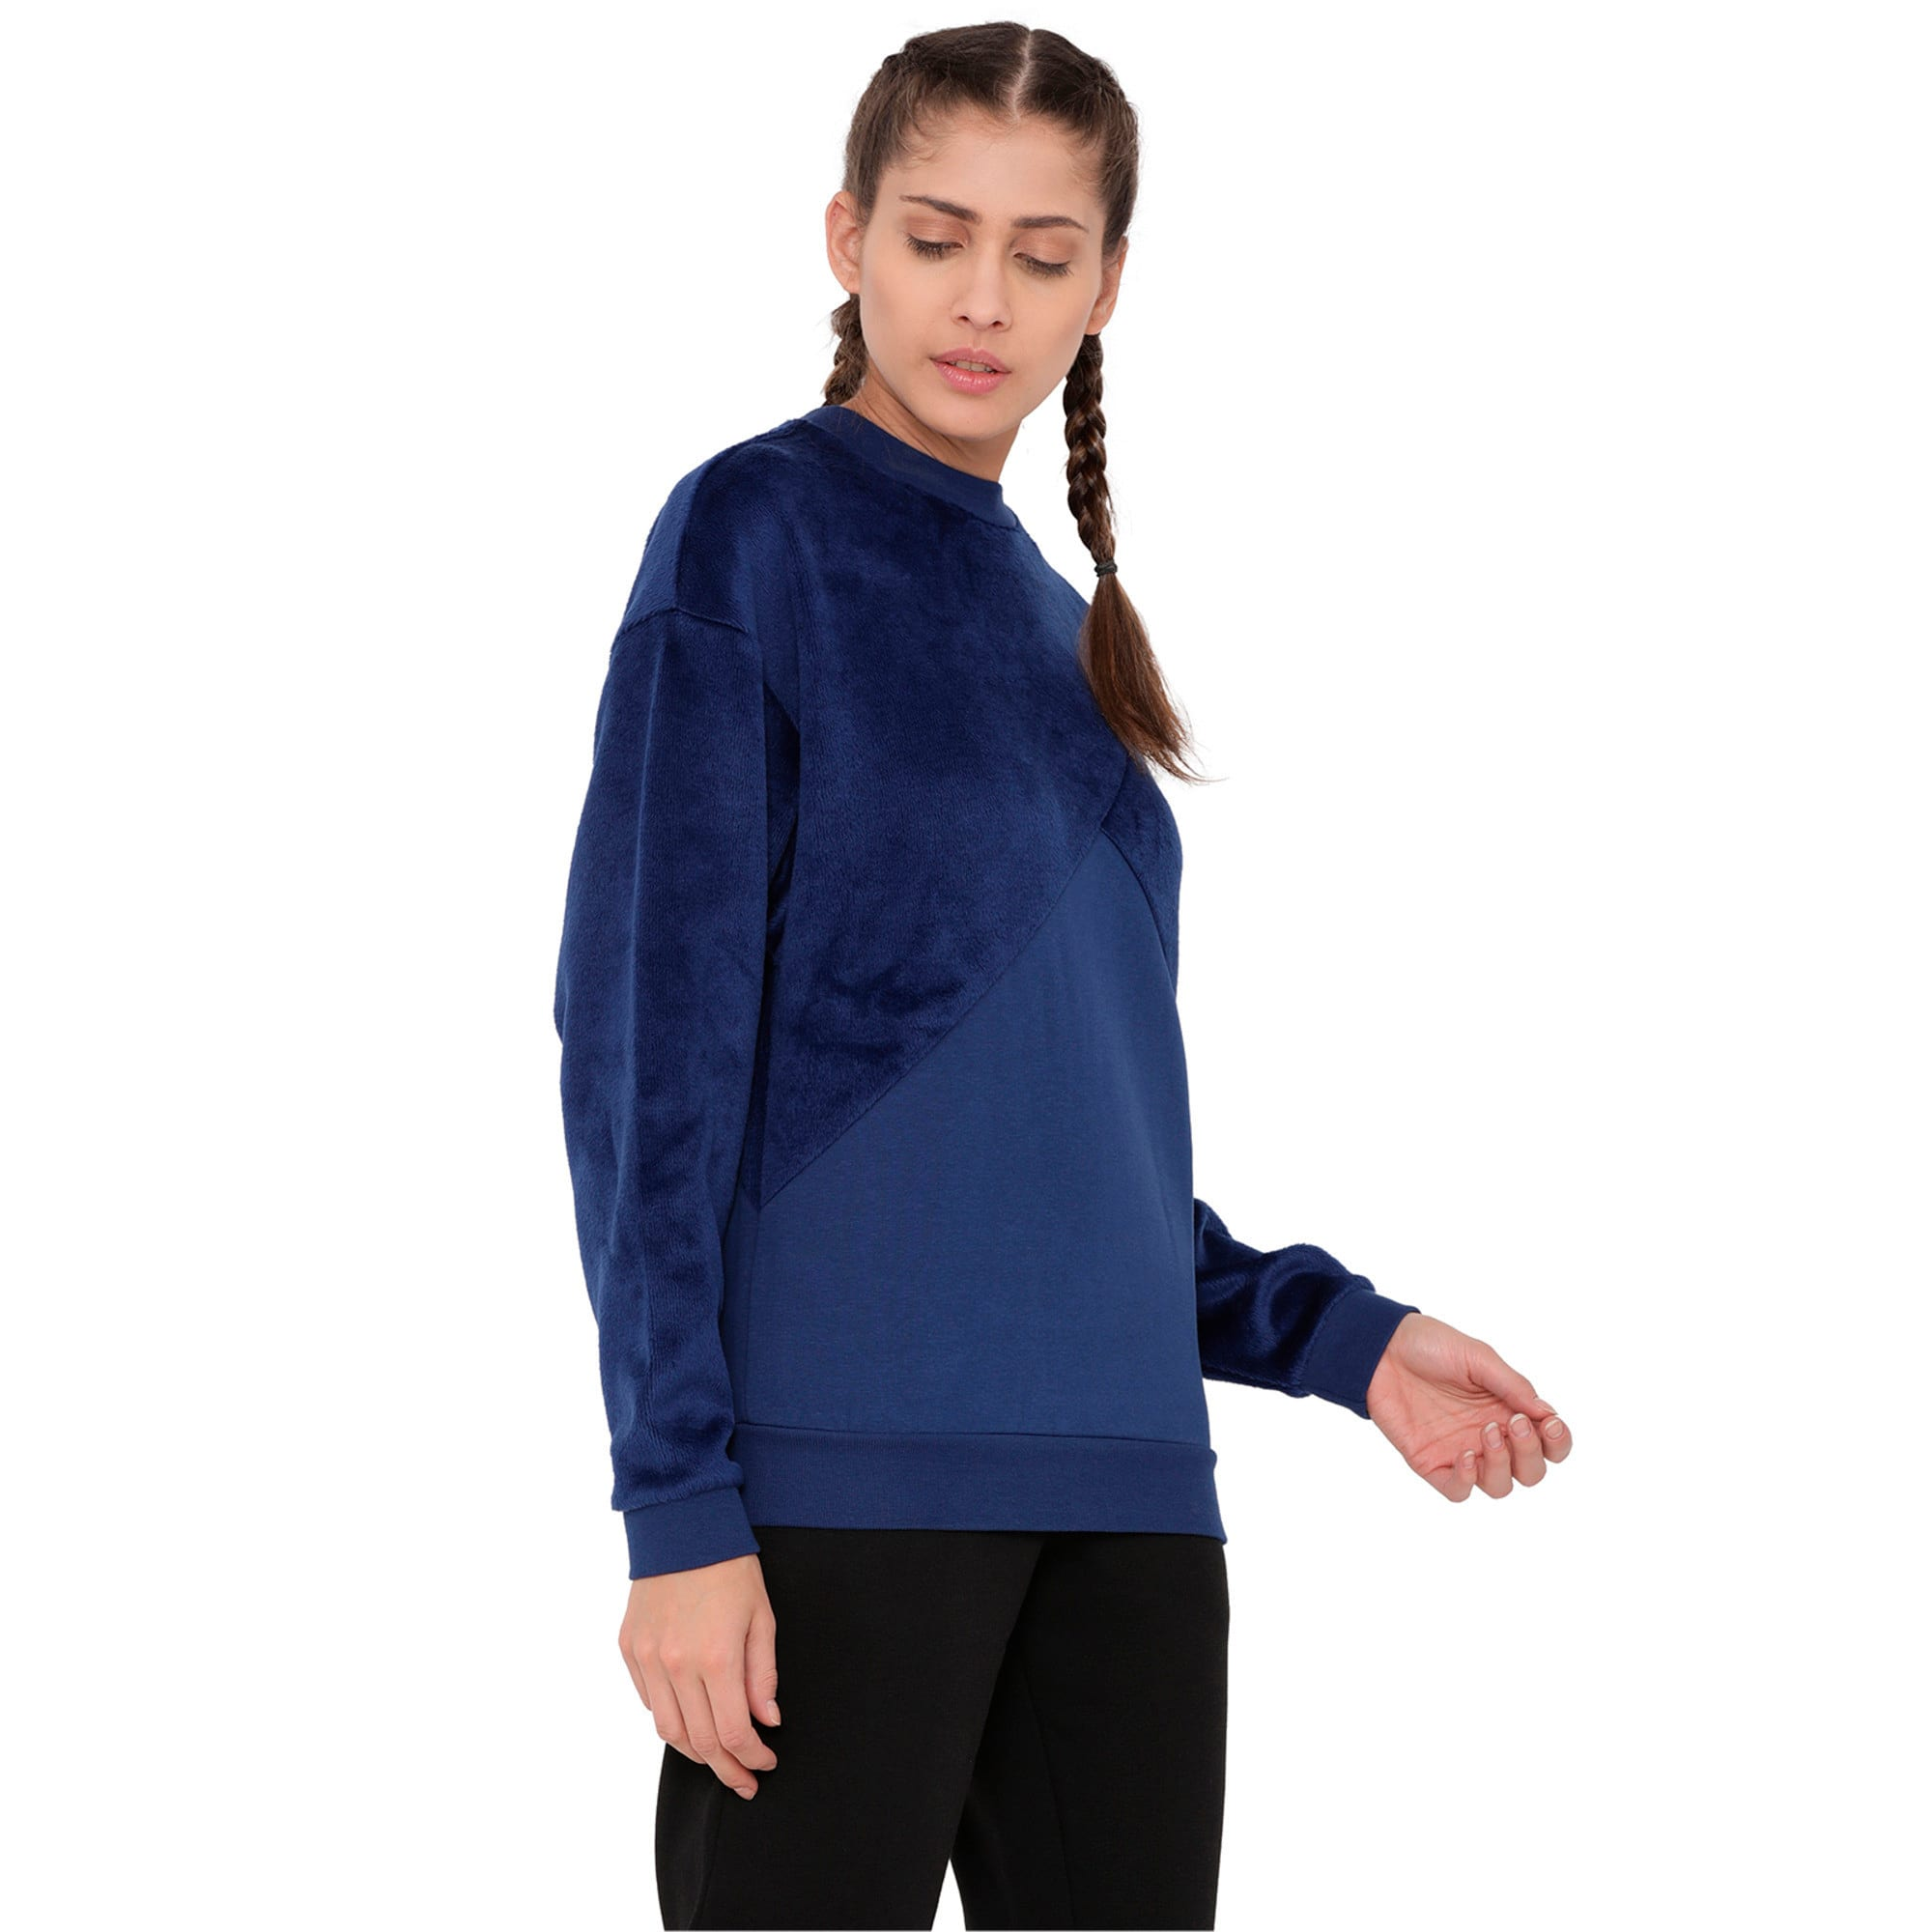 Thumbnail 3 of Archive Women's Fabric Block Sweater, Blue Depths, medium-IND